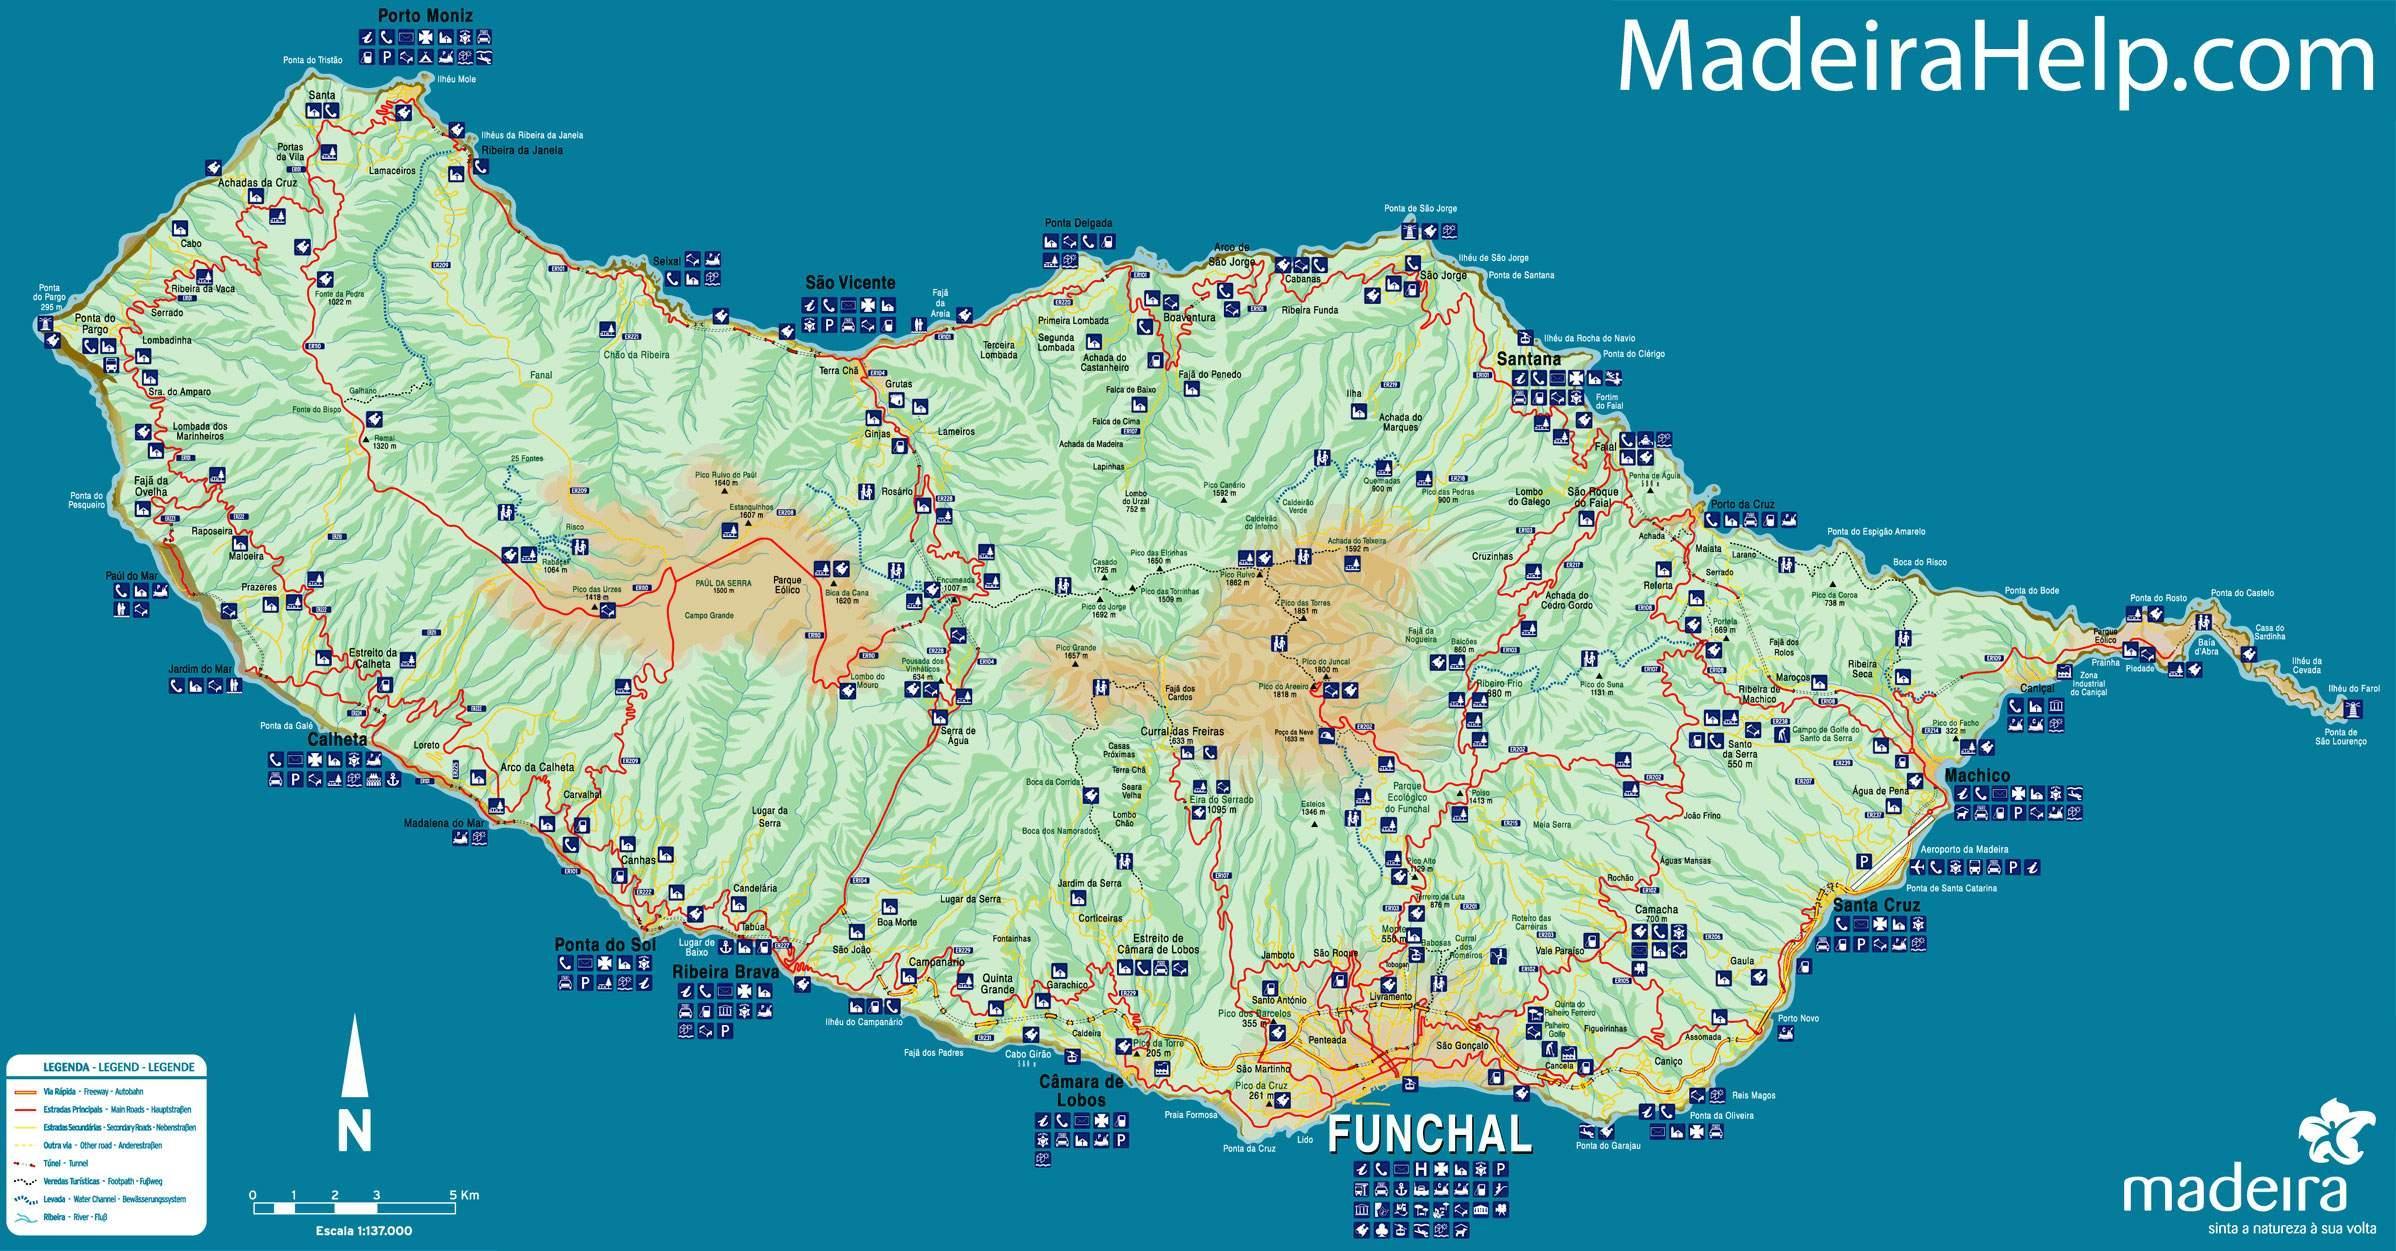 madeira karta Madeira Portugal karta   Karta över Portugal Madeira (Södra Europa  madeira karta